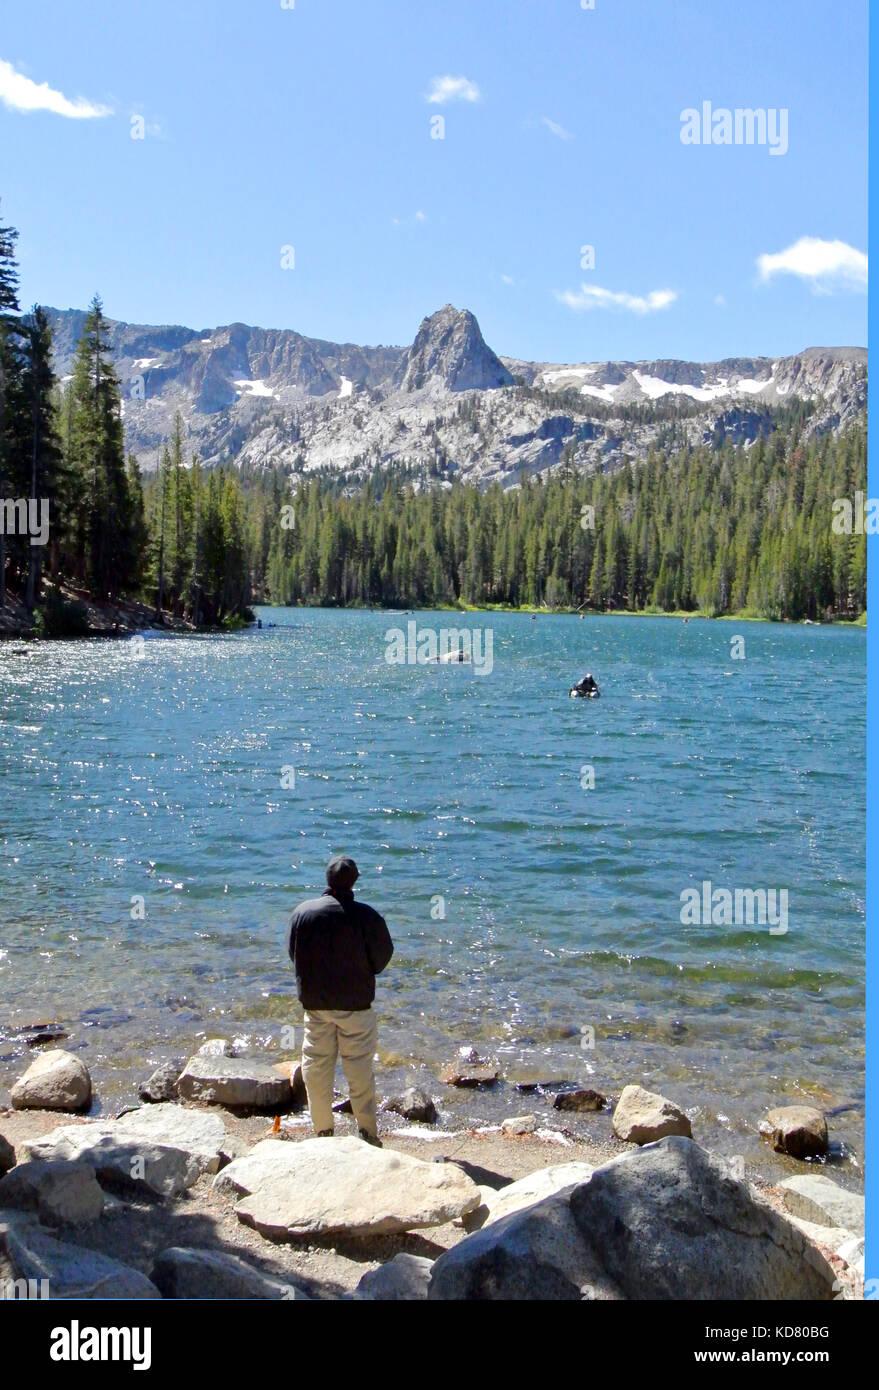 Man fishing in october on june lake ca Stock Photo